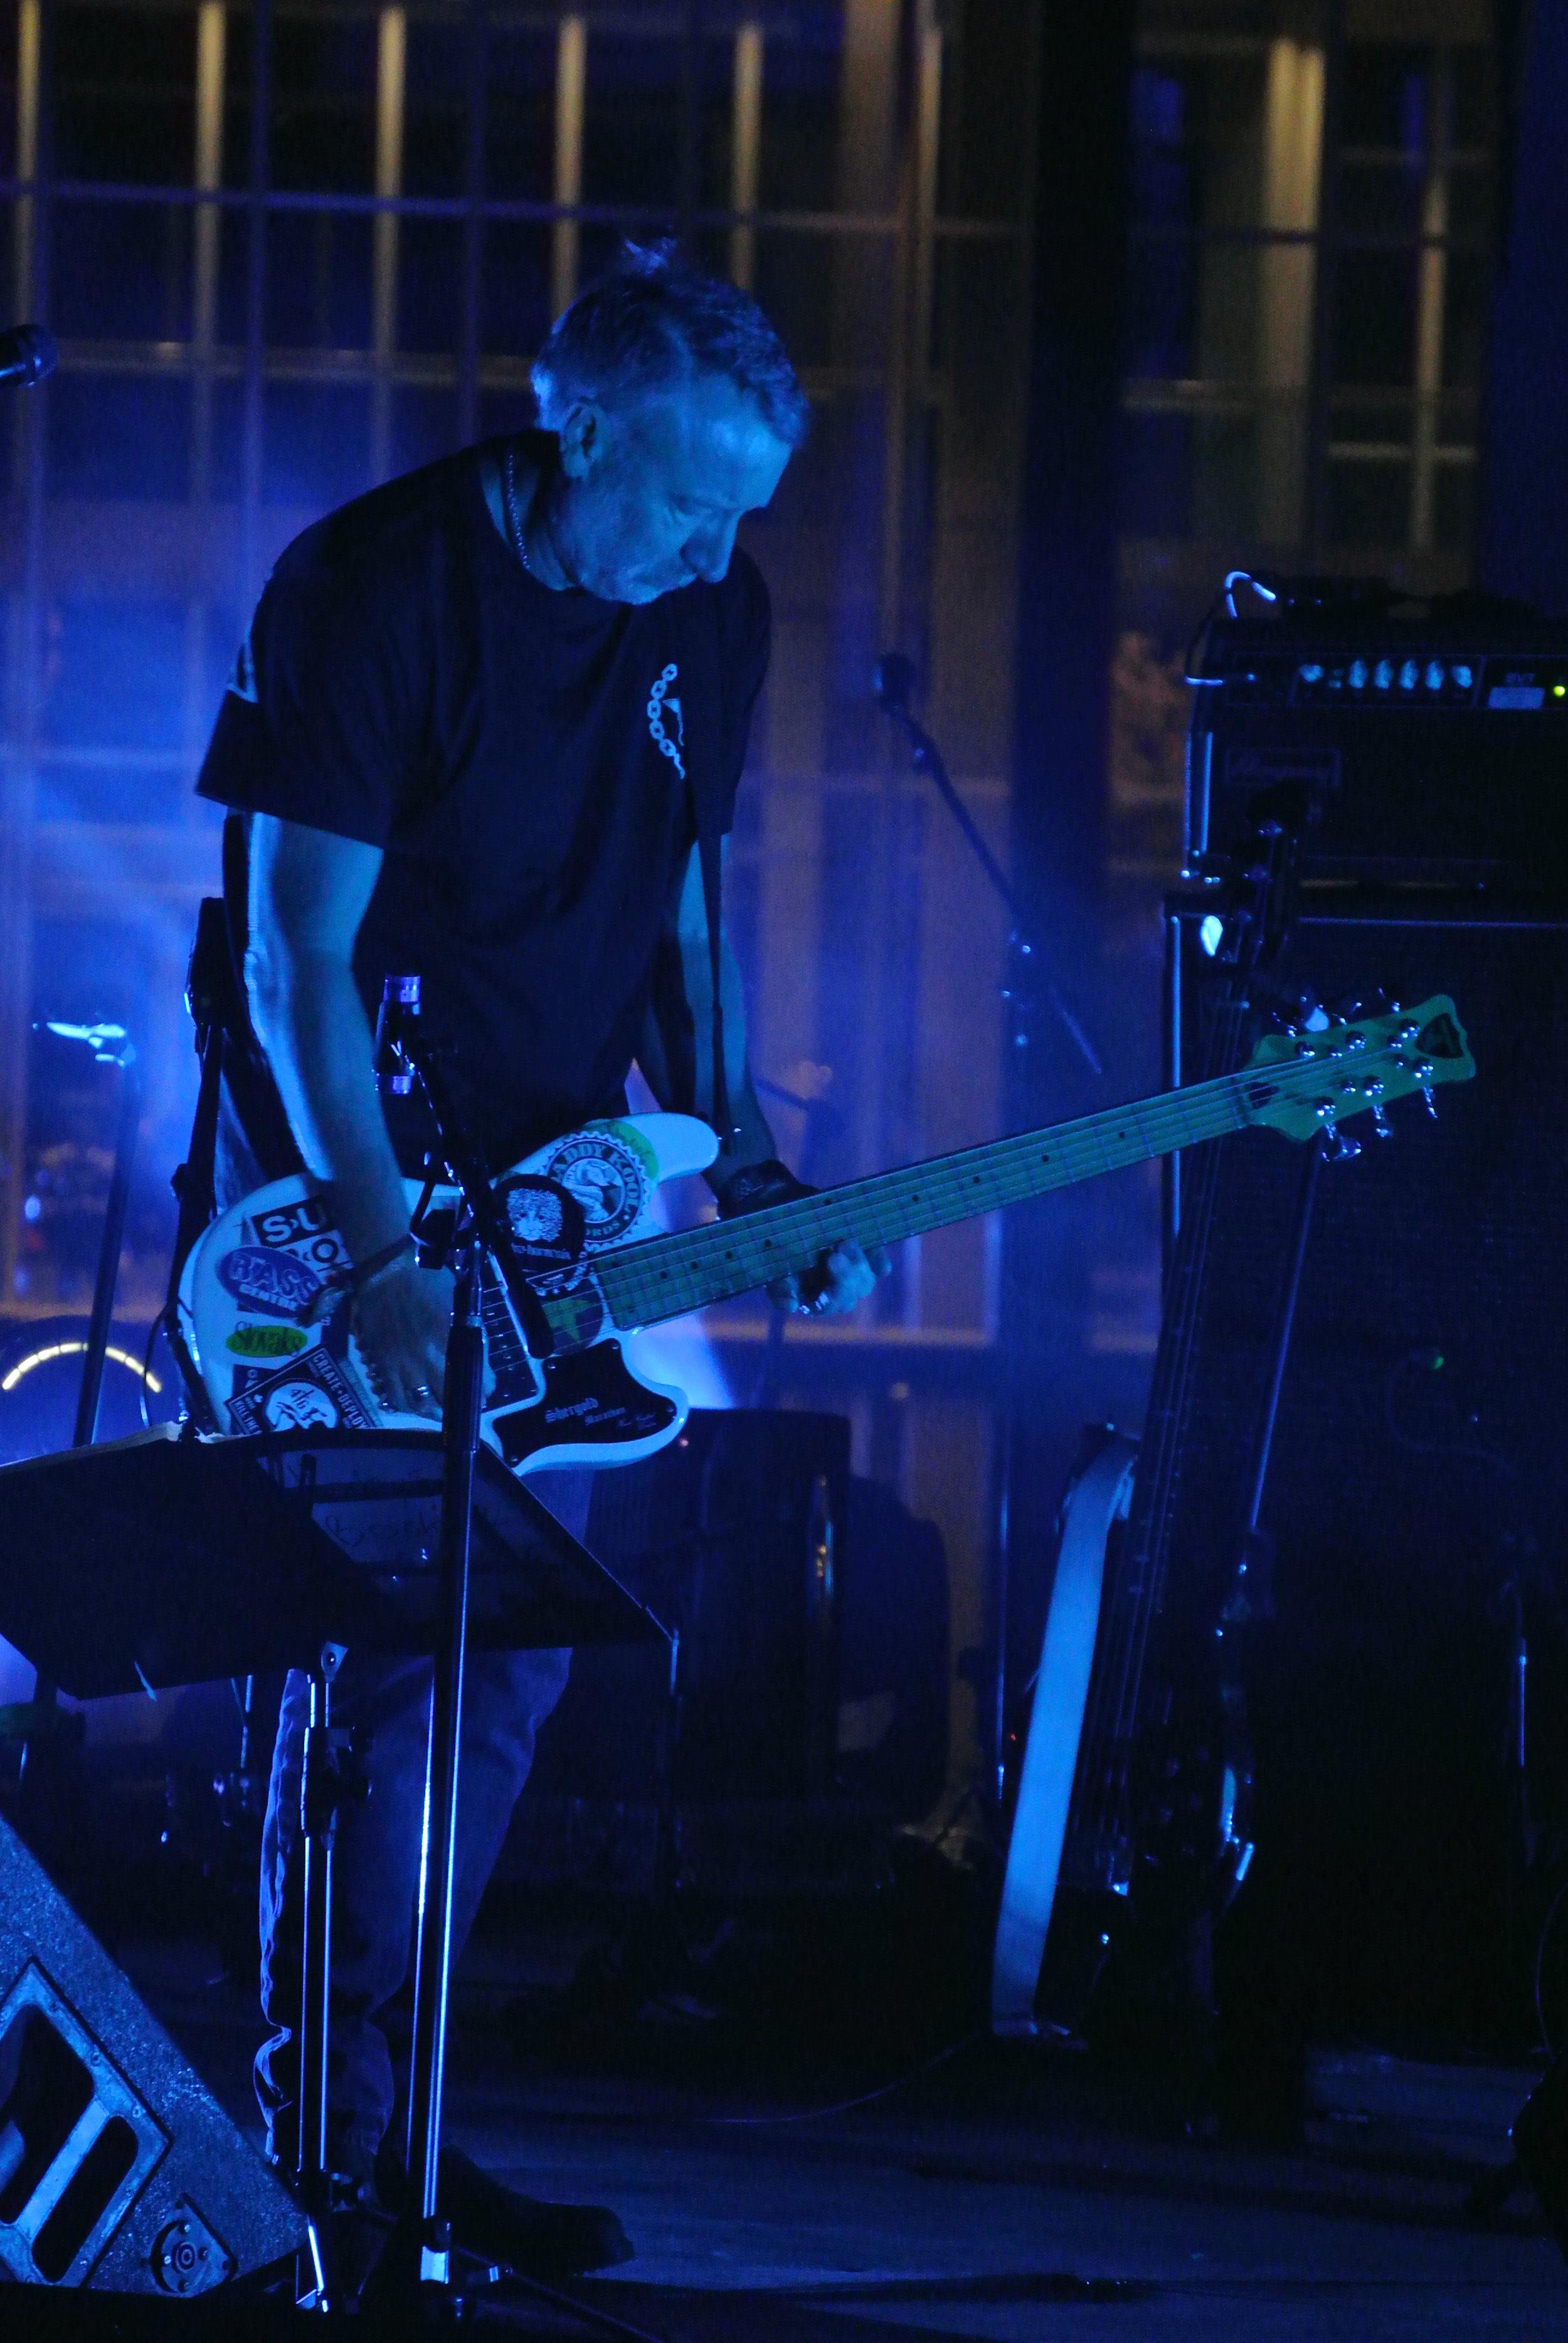 Peter Hook & The Light lit up The Modern stage - Photo Credit: Prewitt Scott-Jackson